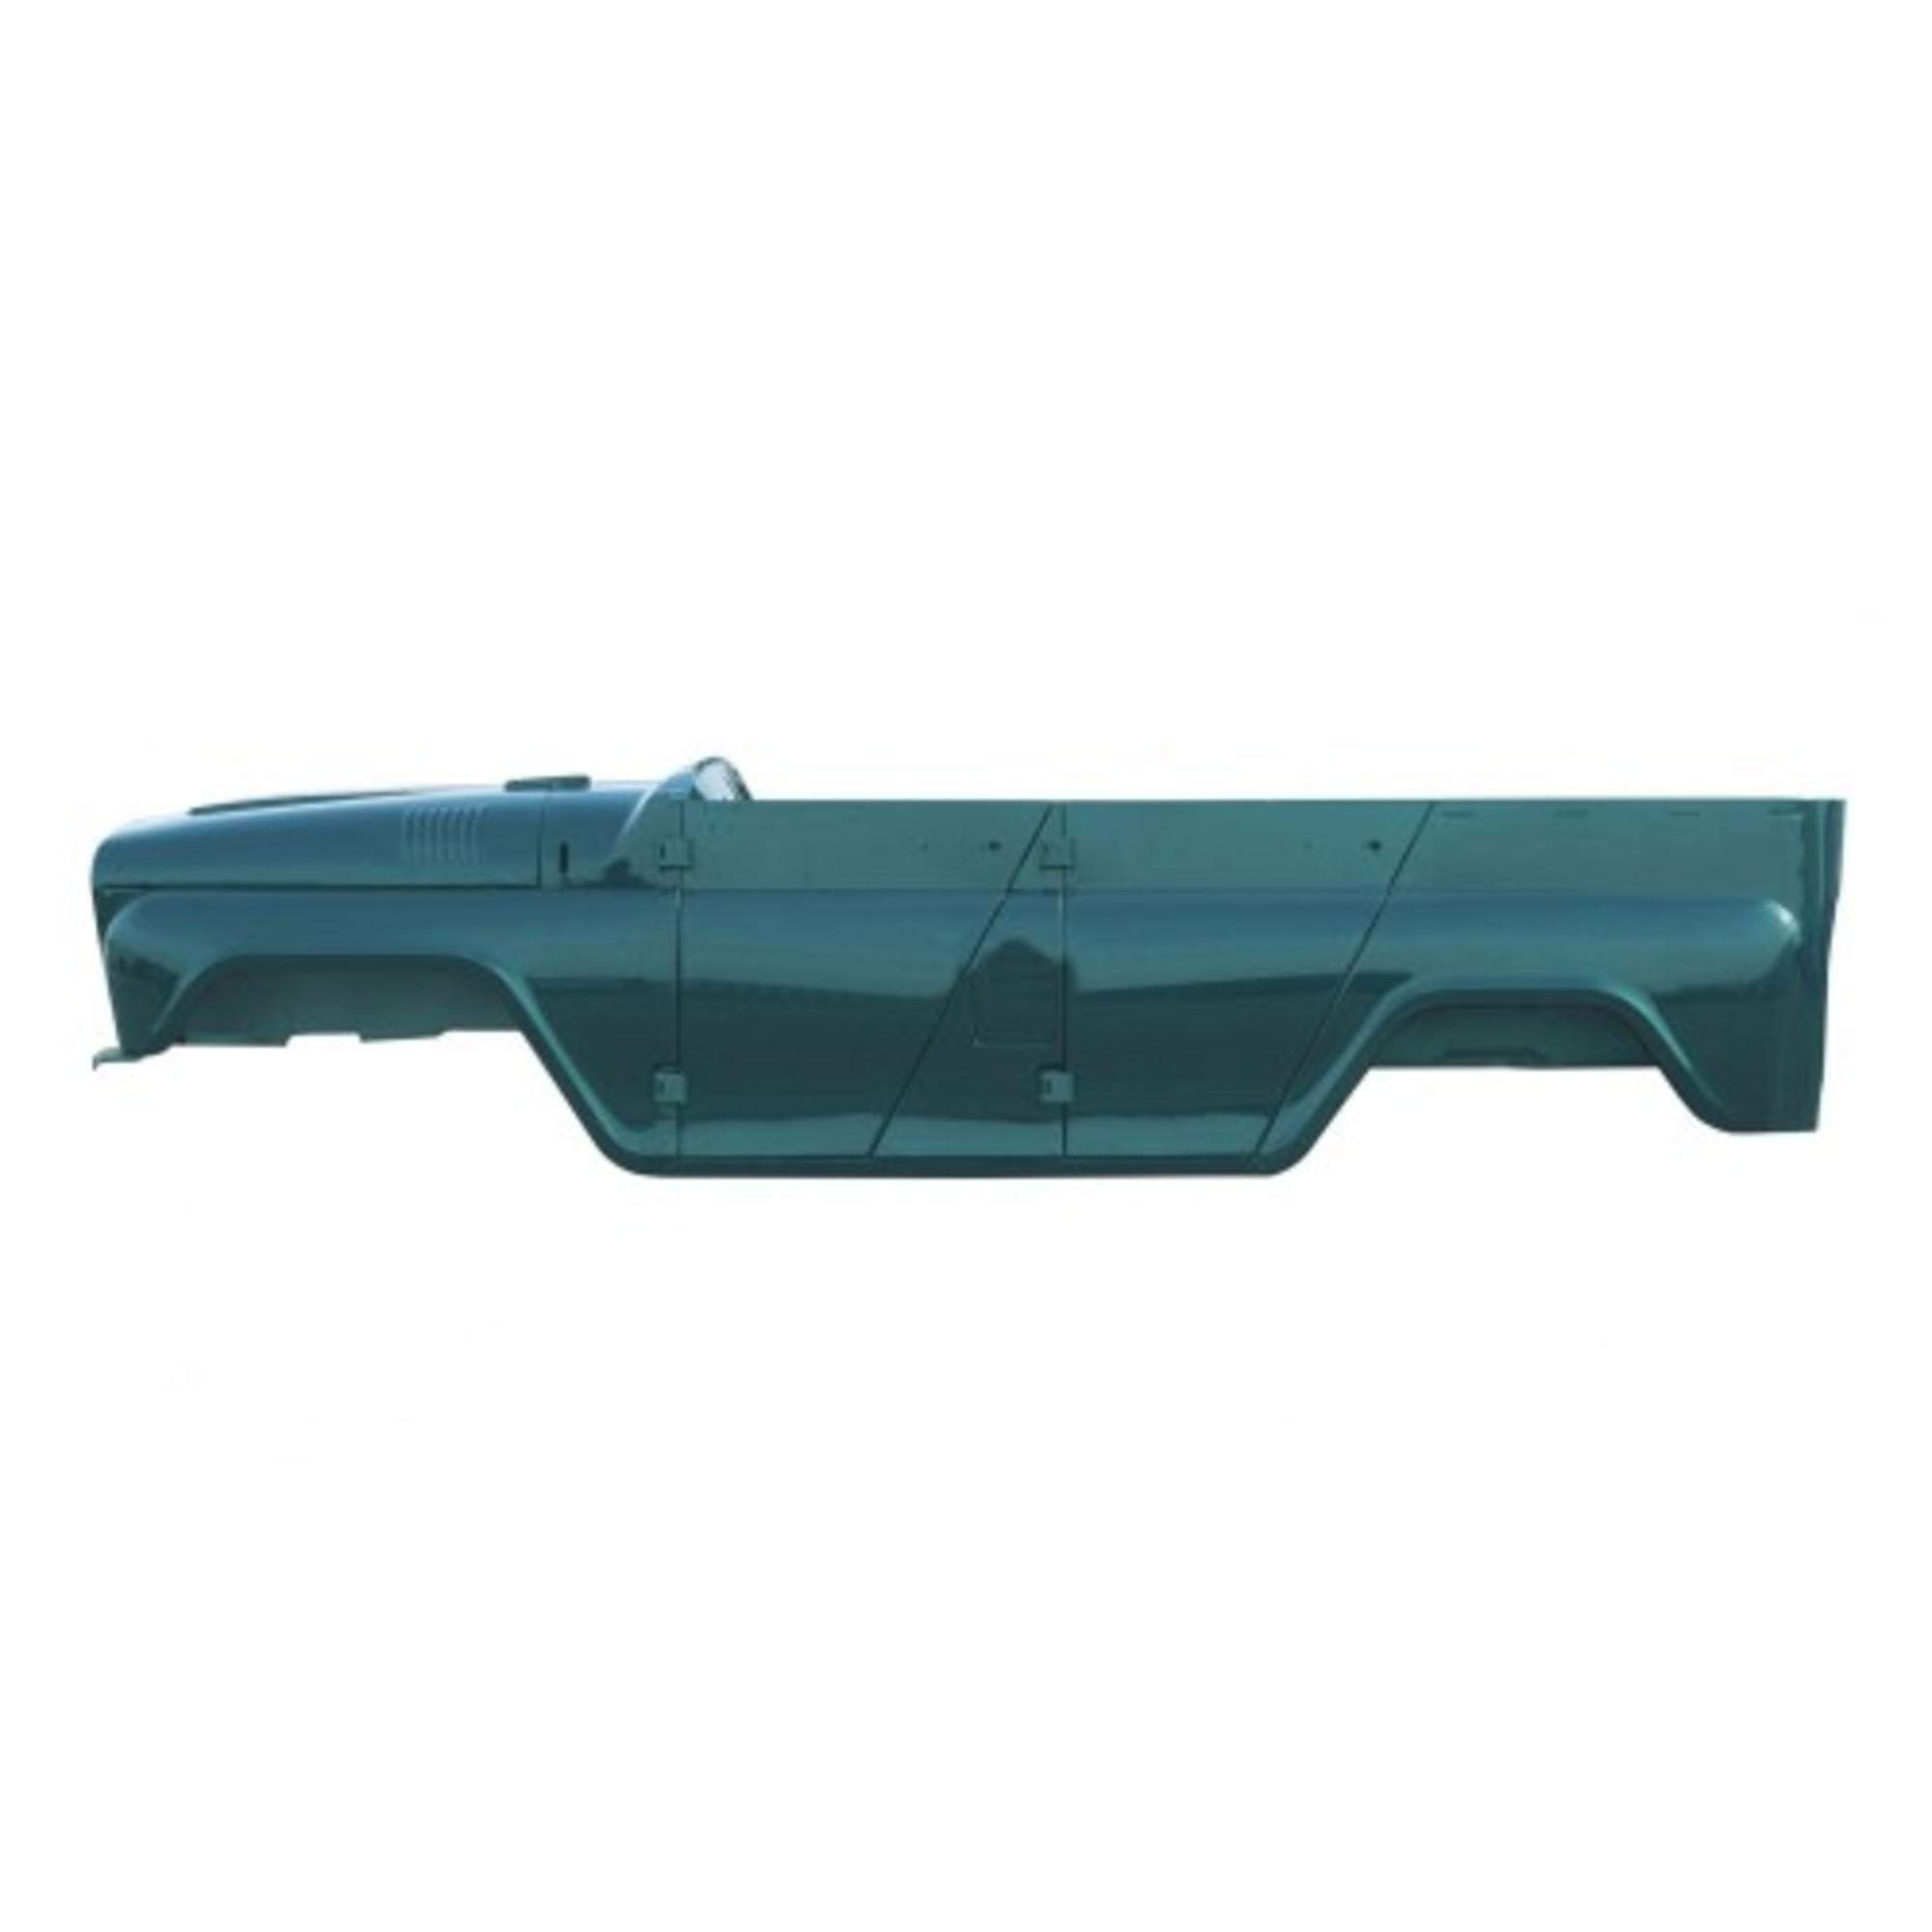 Каркас кузова УАЗ-31514 (легковой под крышу) амулет металлик номер 31514-5000014-30